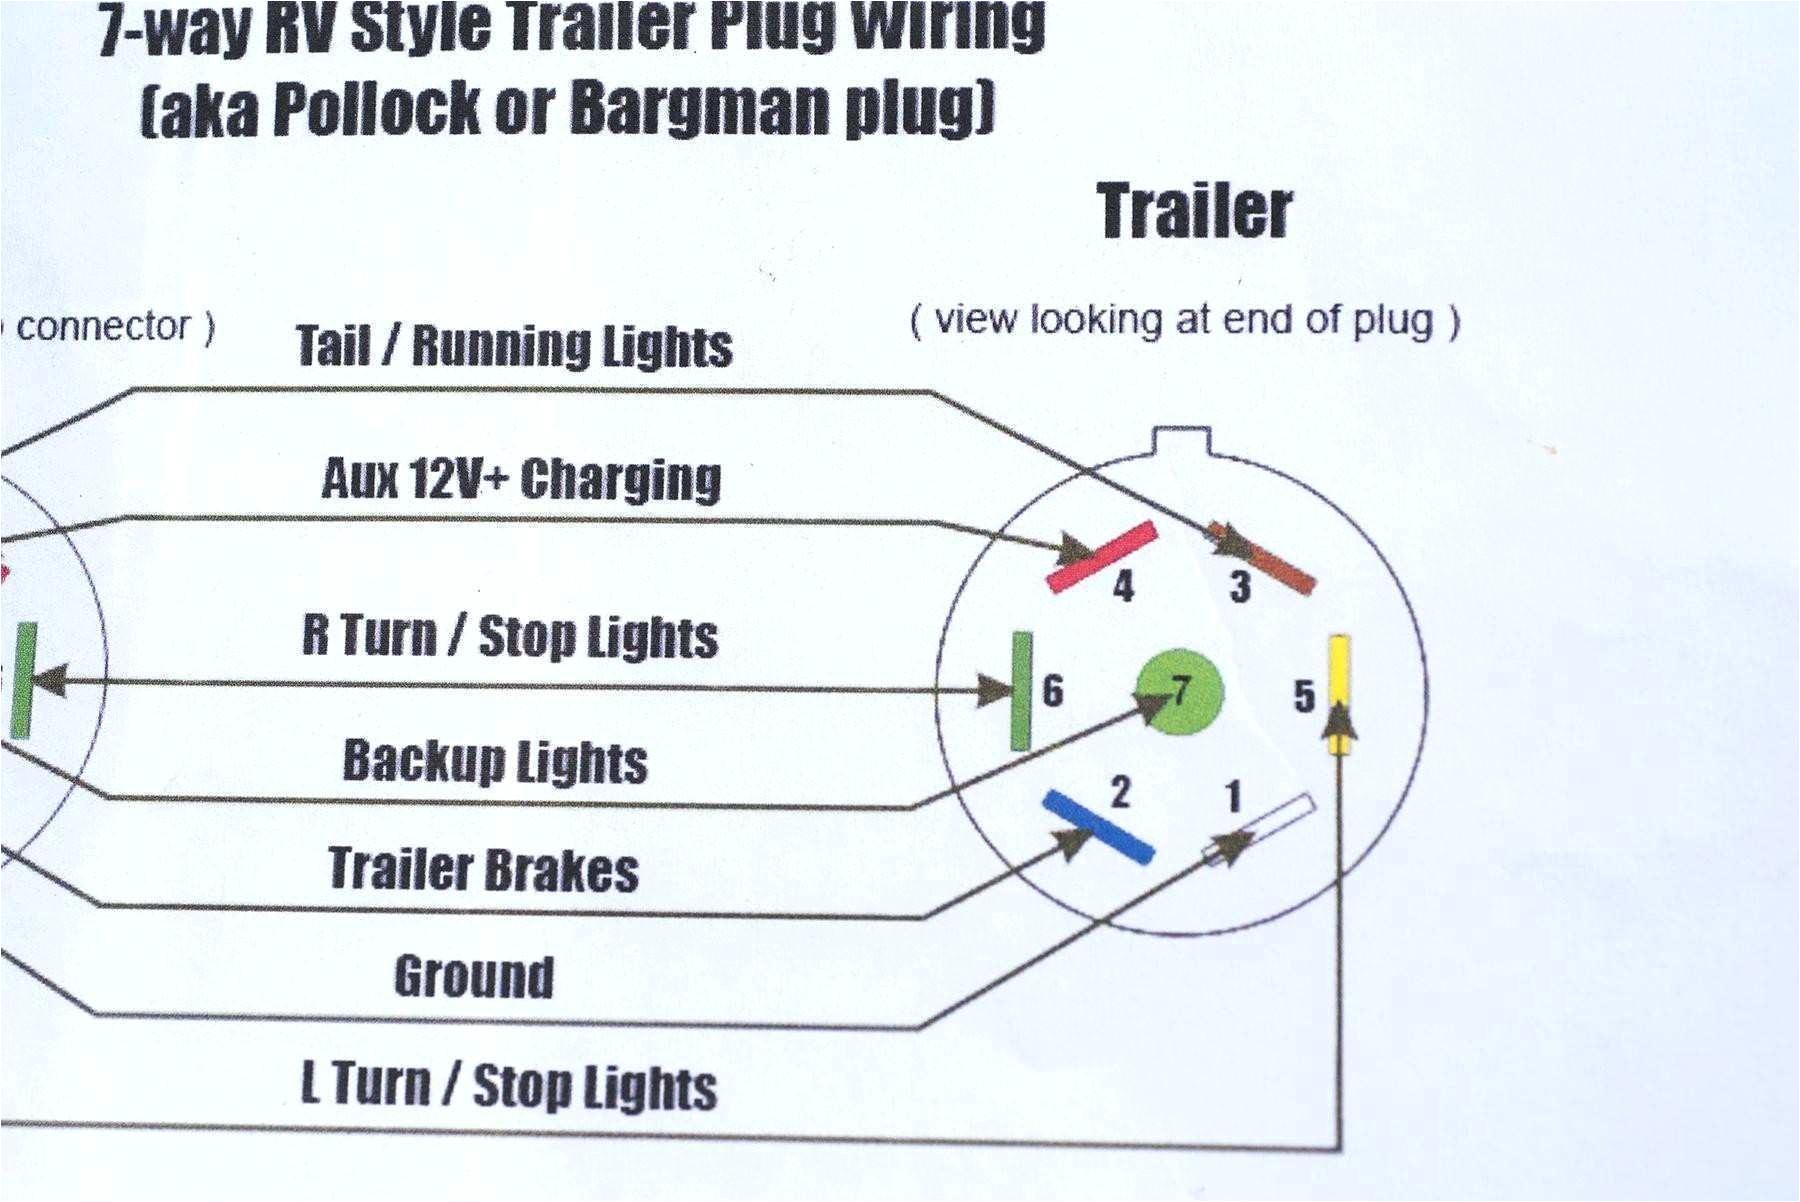 reese trailer wiring diagram wiring diagrams reese towpower wiring diagram reese 7 pin trailer wiring diagram